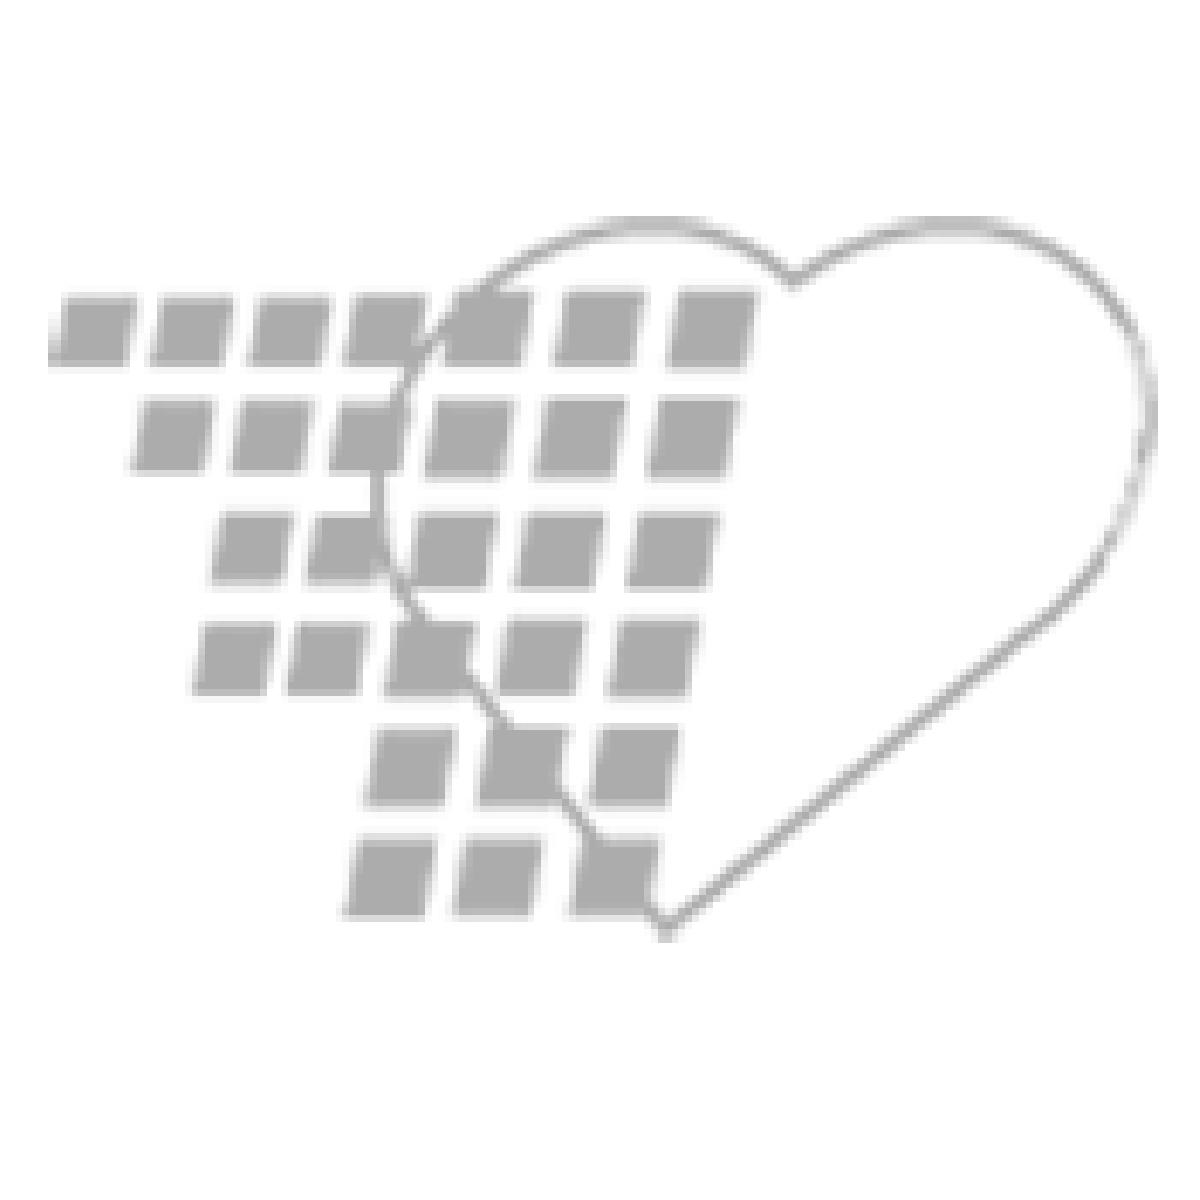 07-41-6000 - Pleur-evac® A-6000 Adult/Pediatric